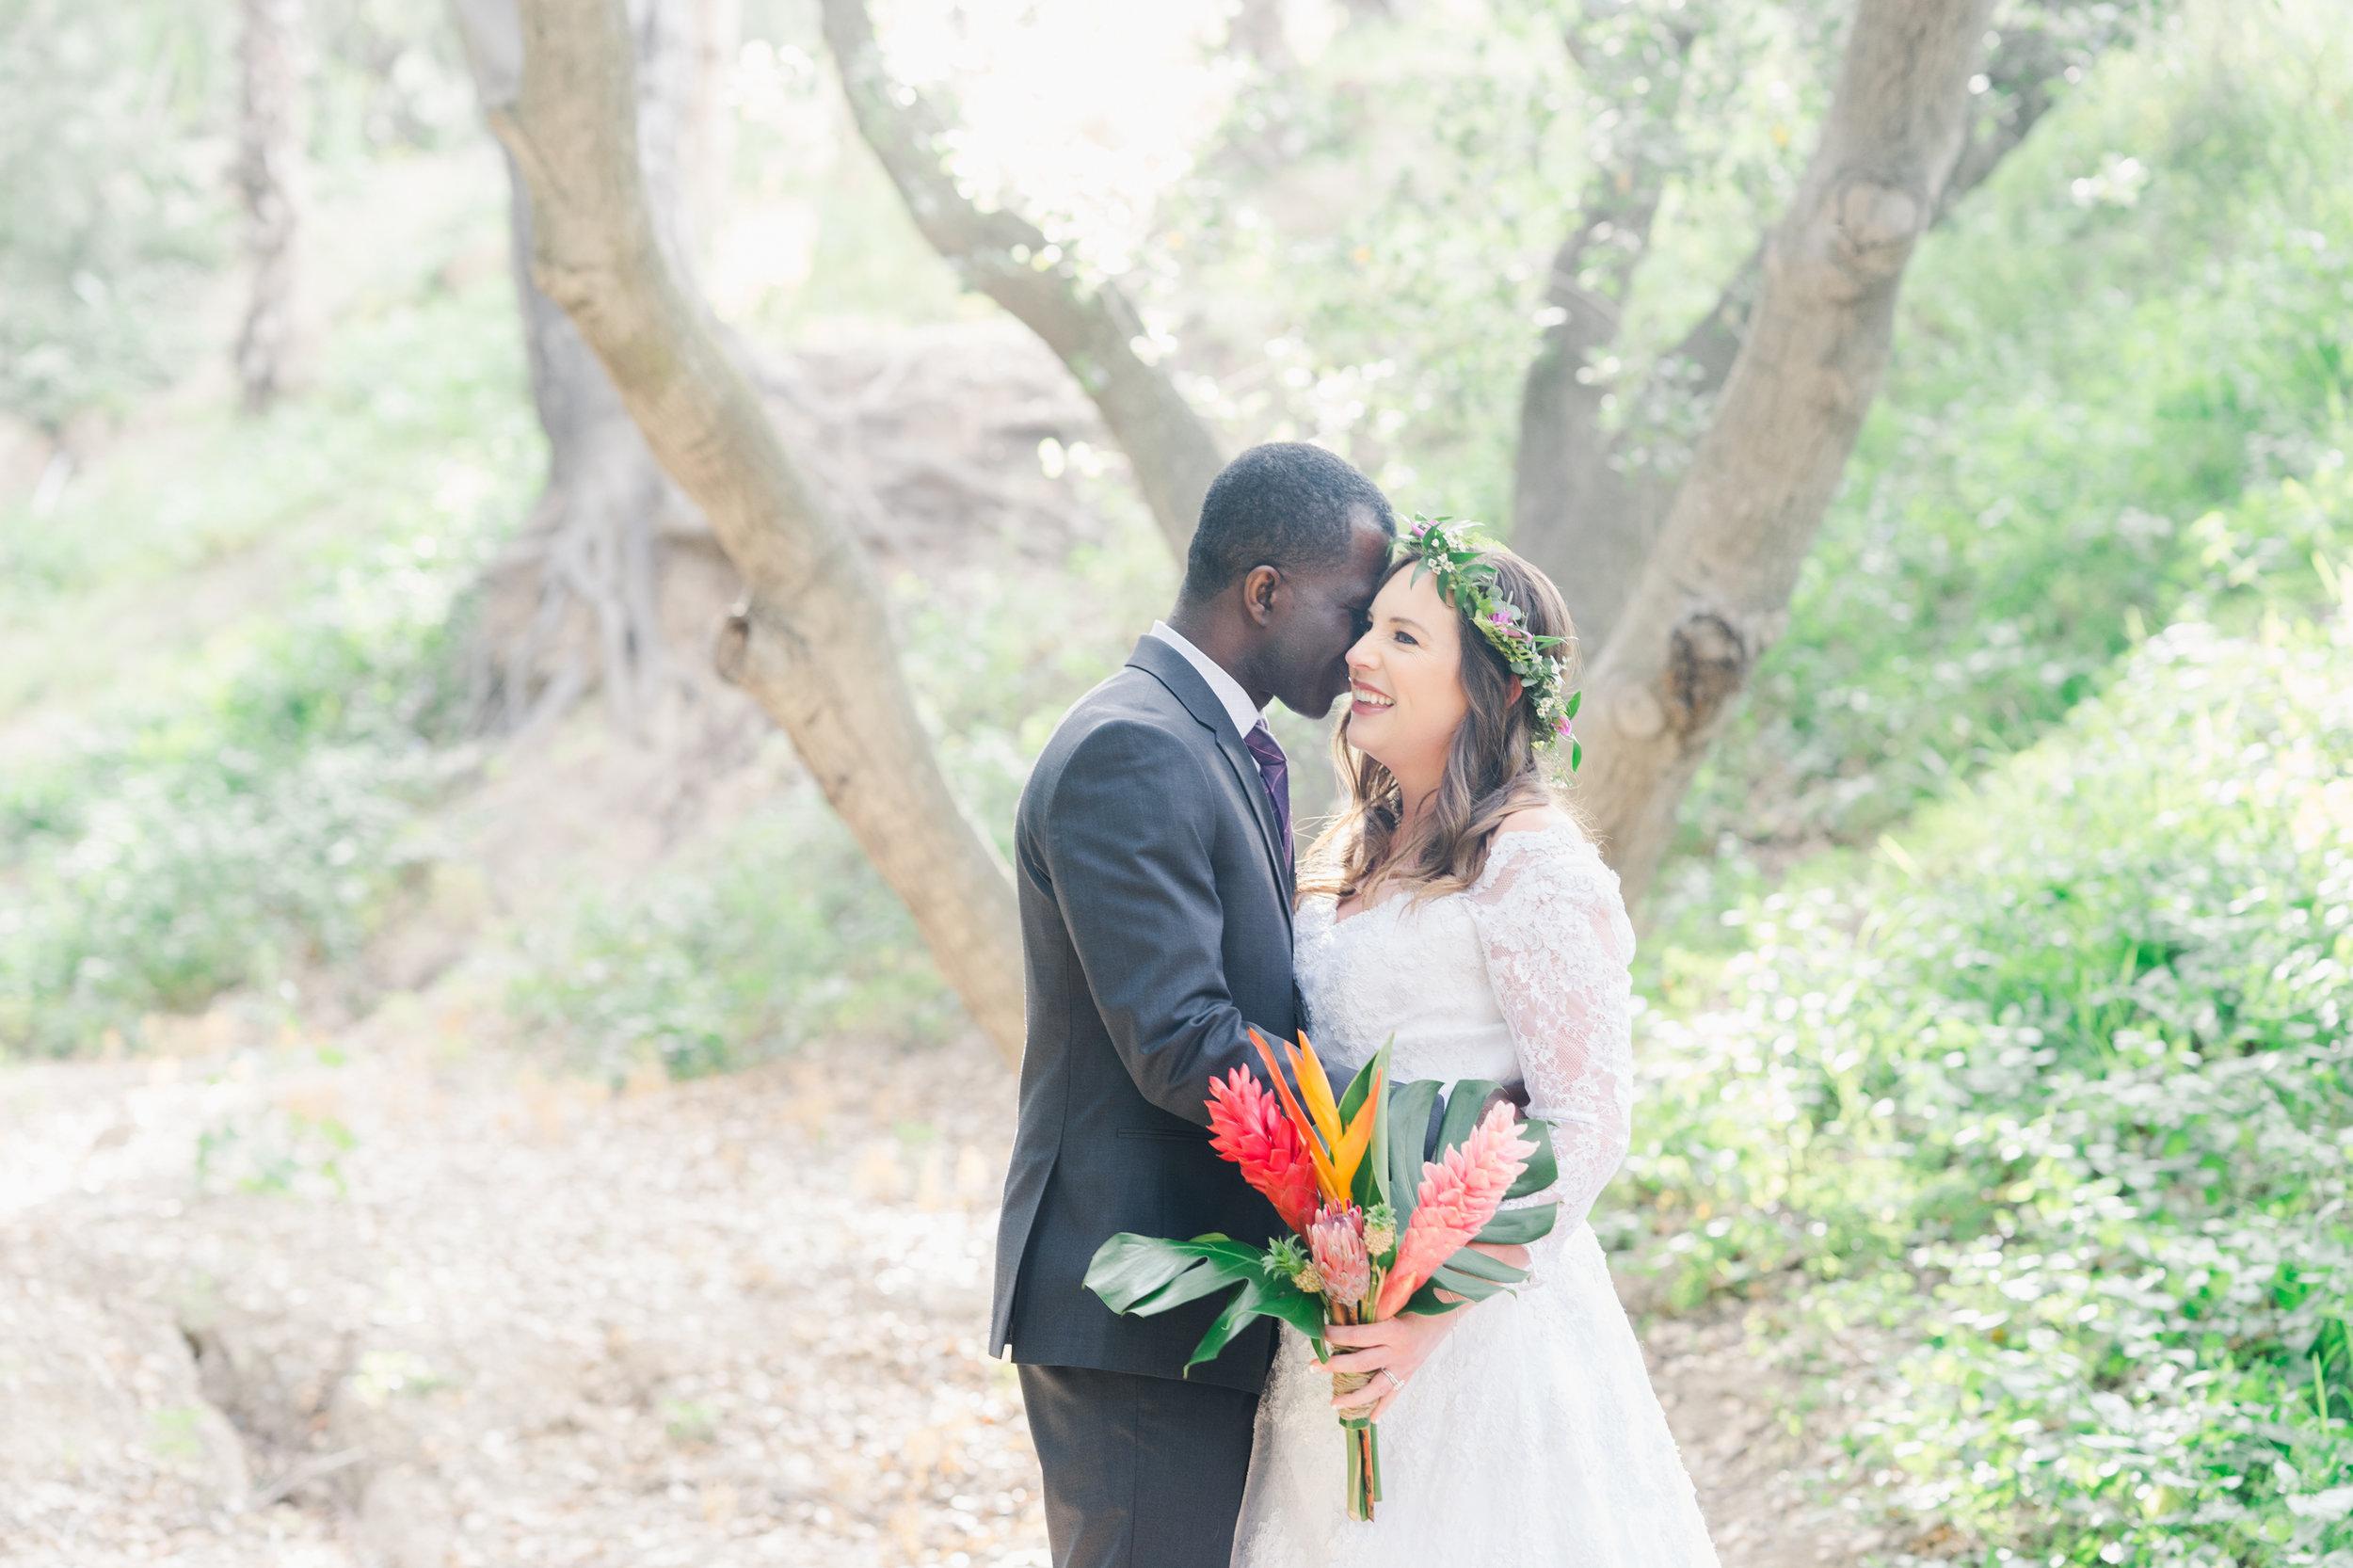 rancho-las-lomas-wedding-kelsey-sim_0170.JPG